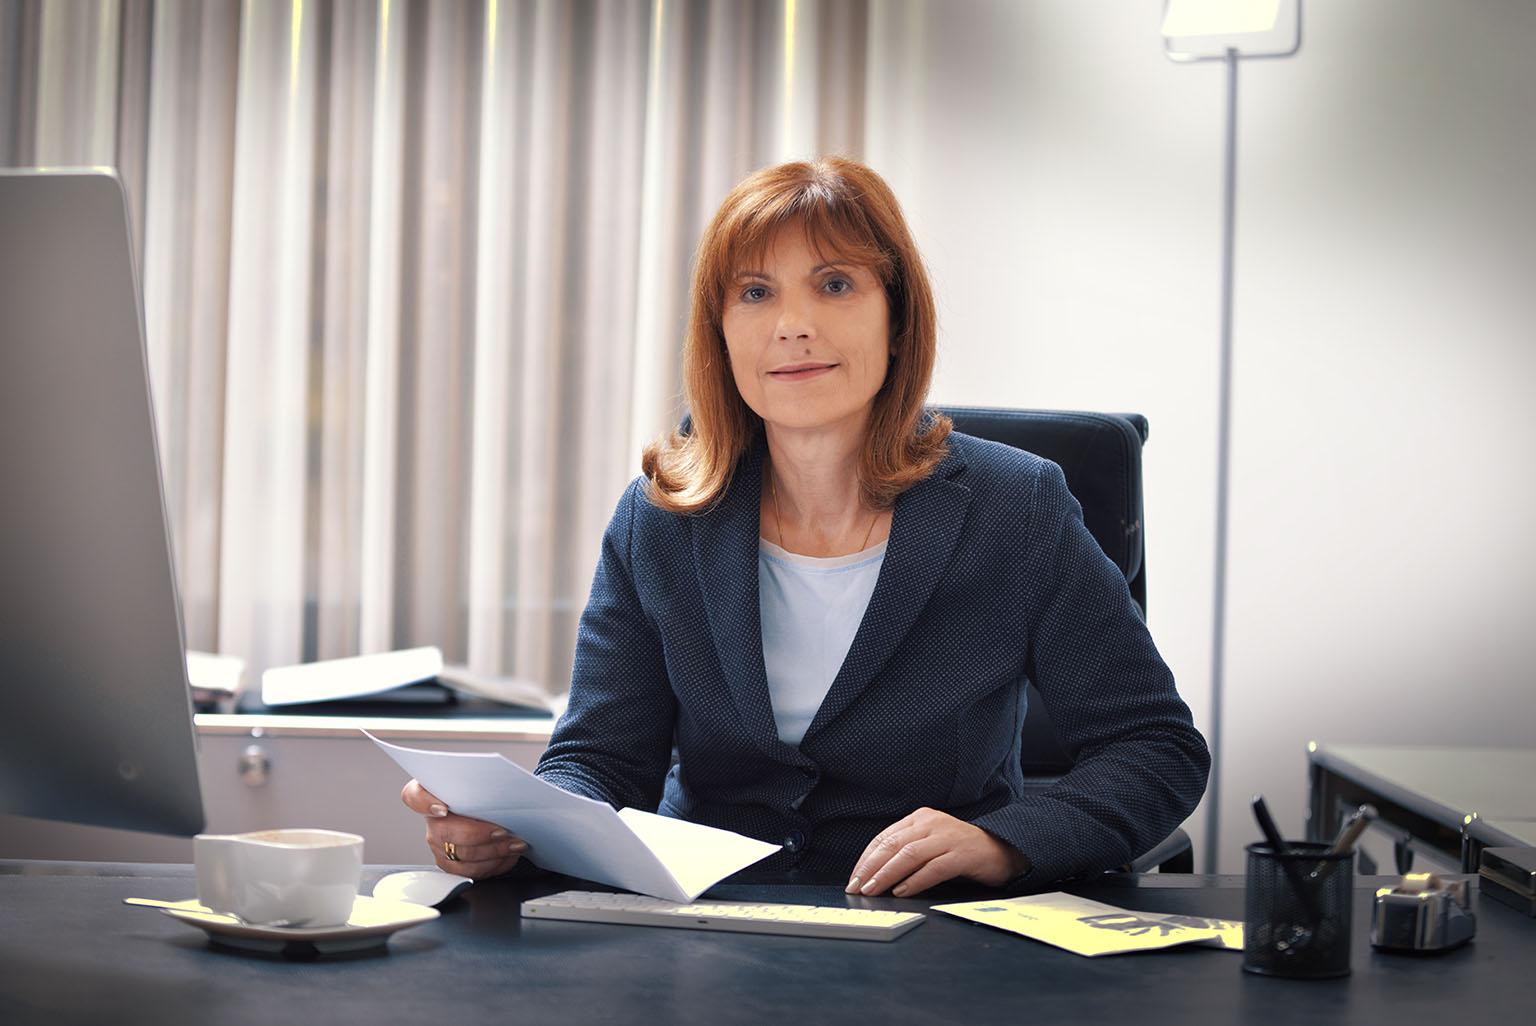 Martina Jost AfD Frauen Quote Frauenquote